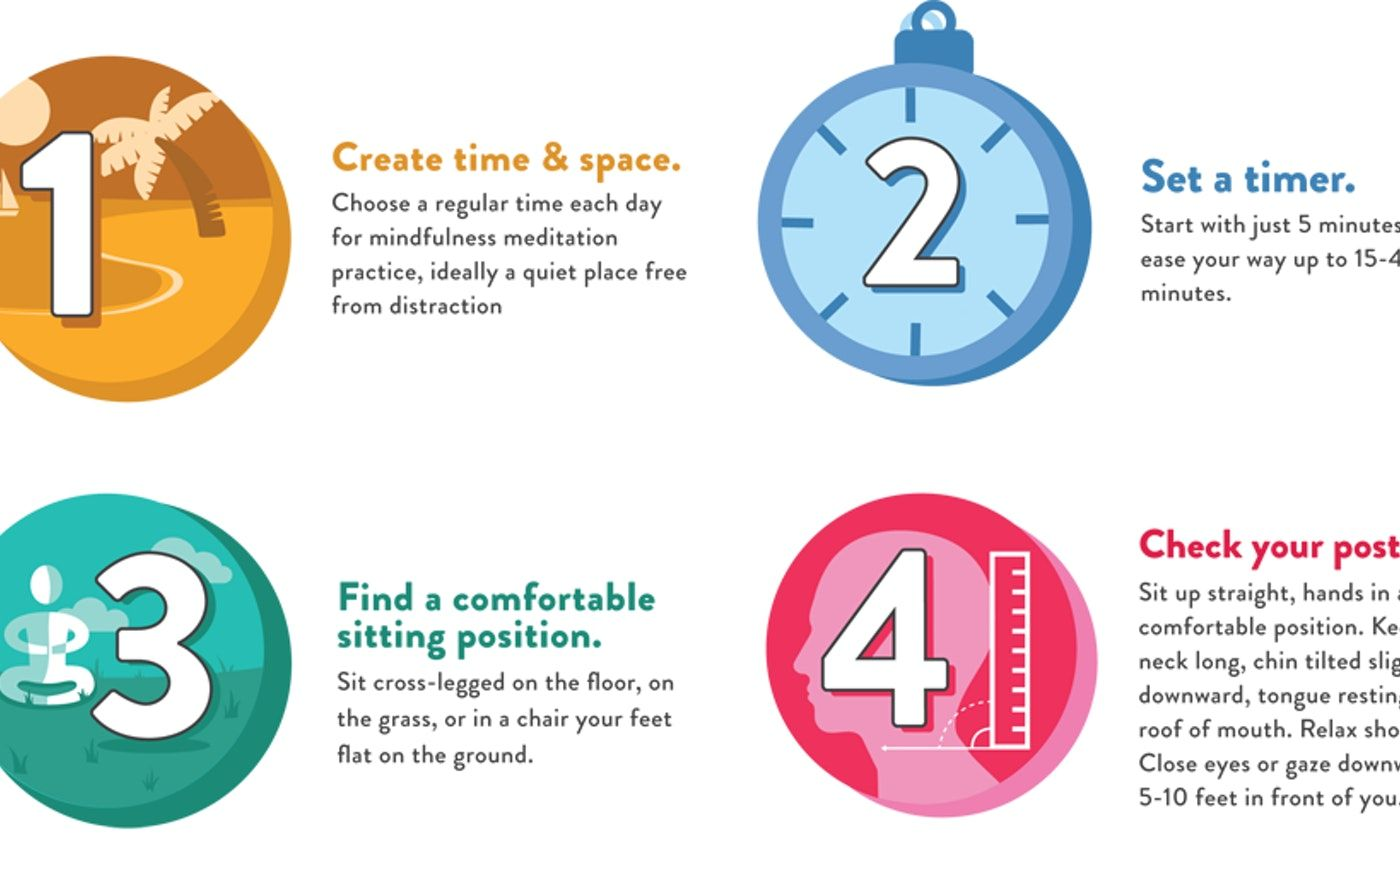 10 Steps To Mindfulness Meditation